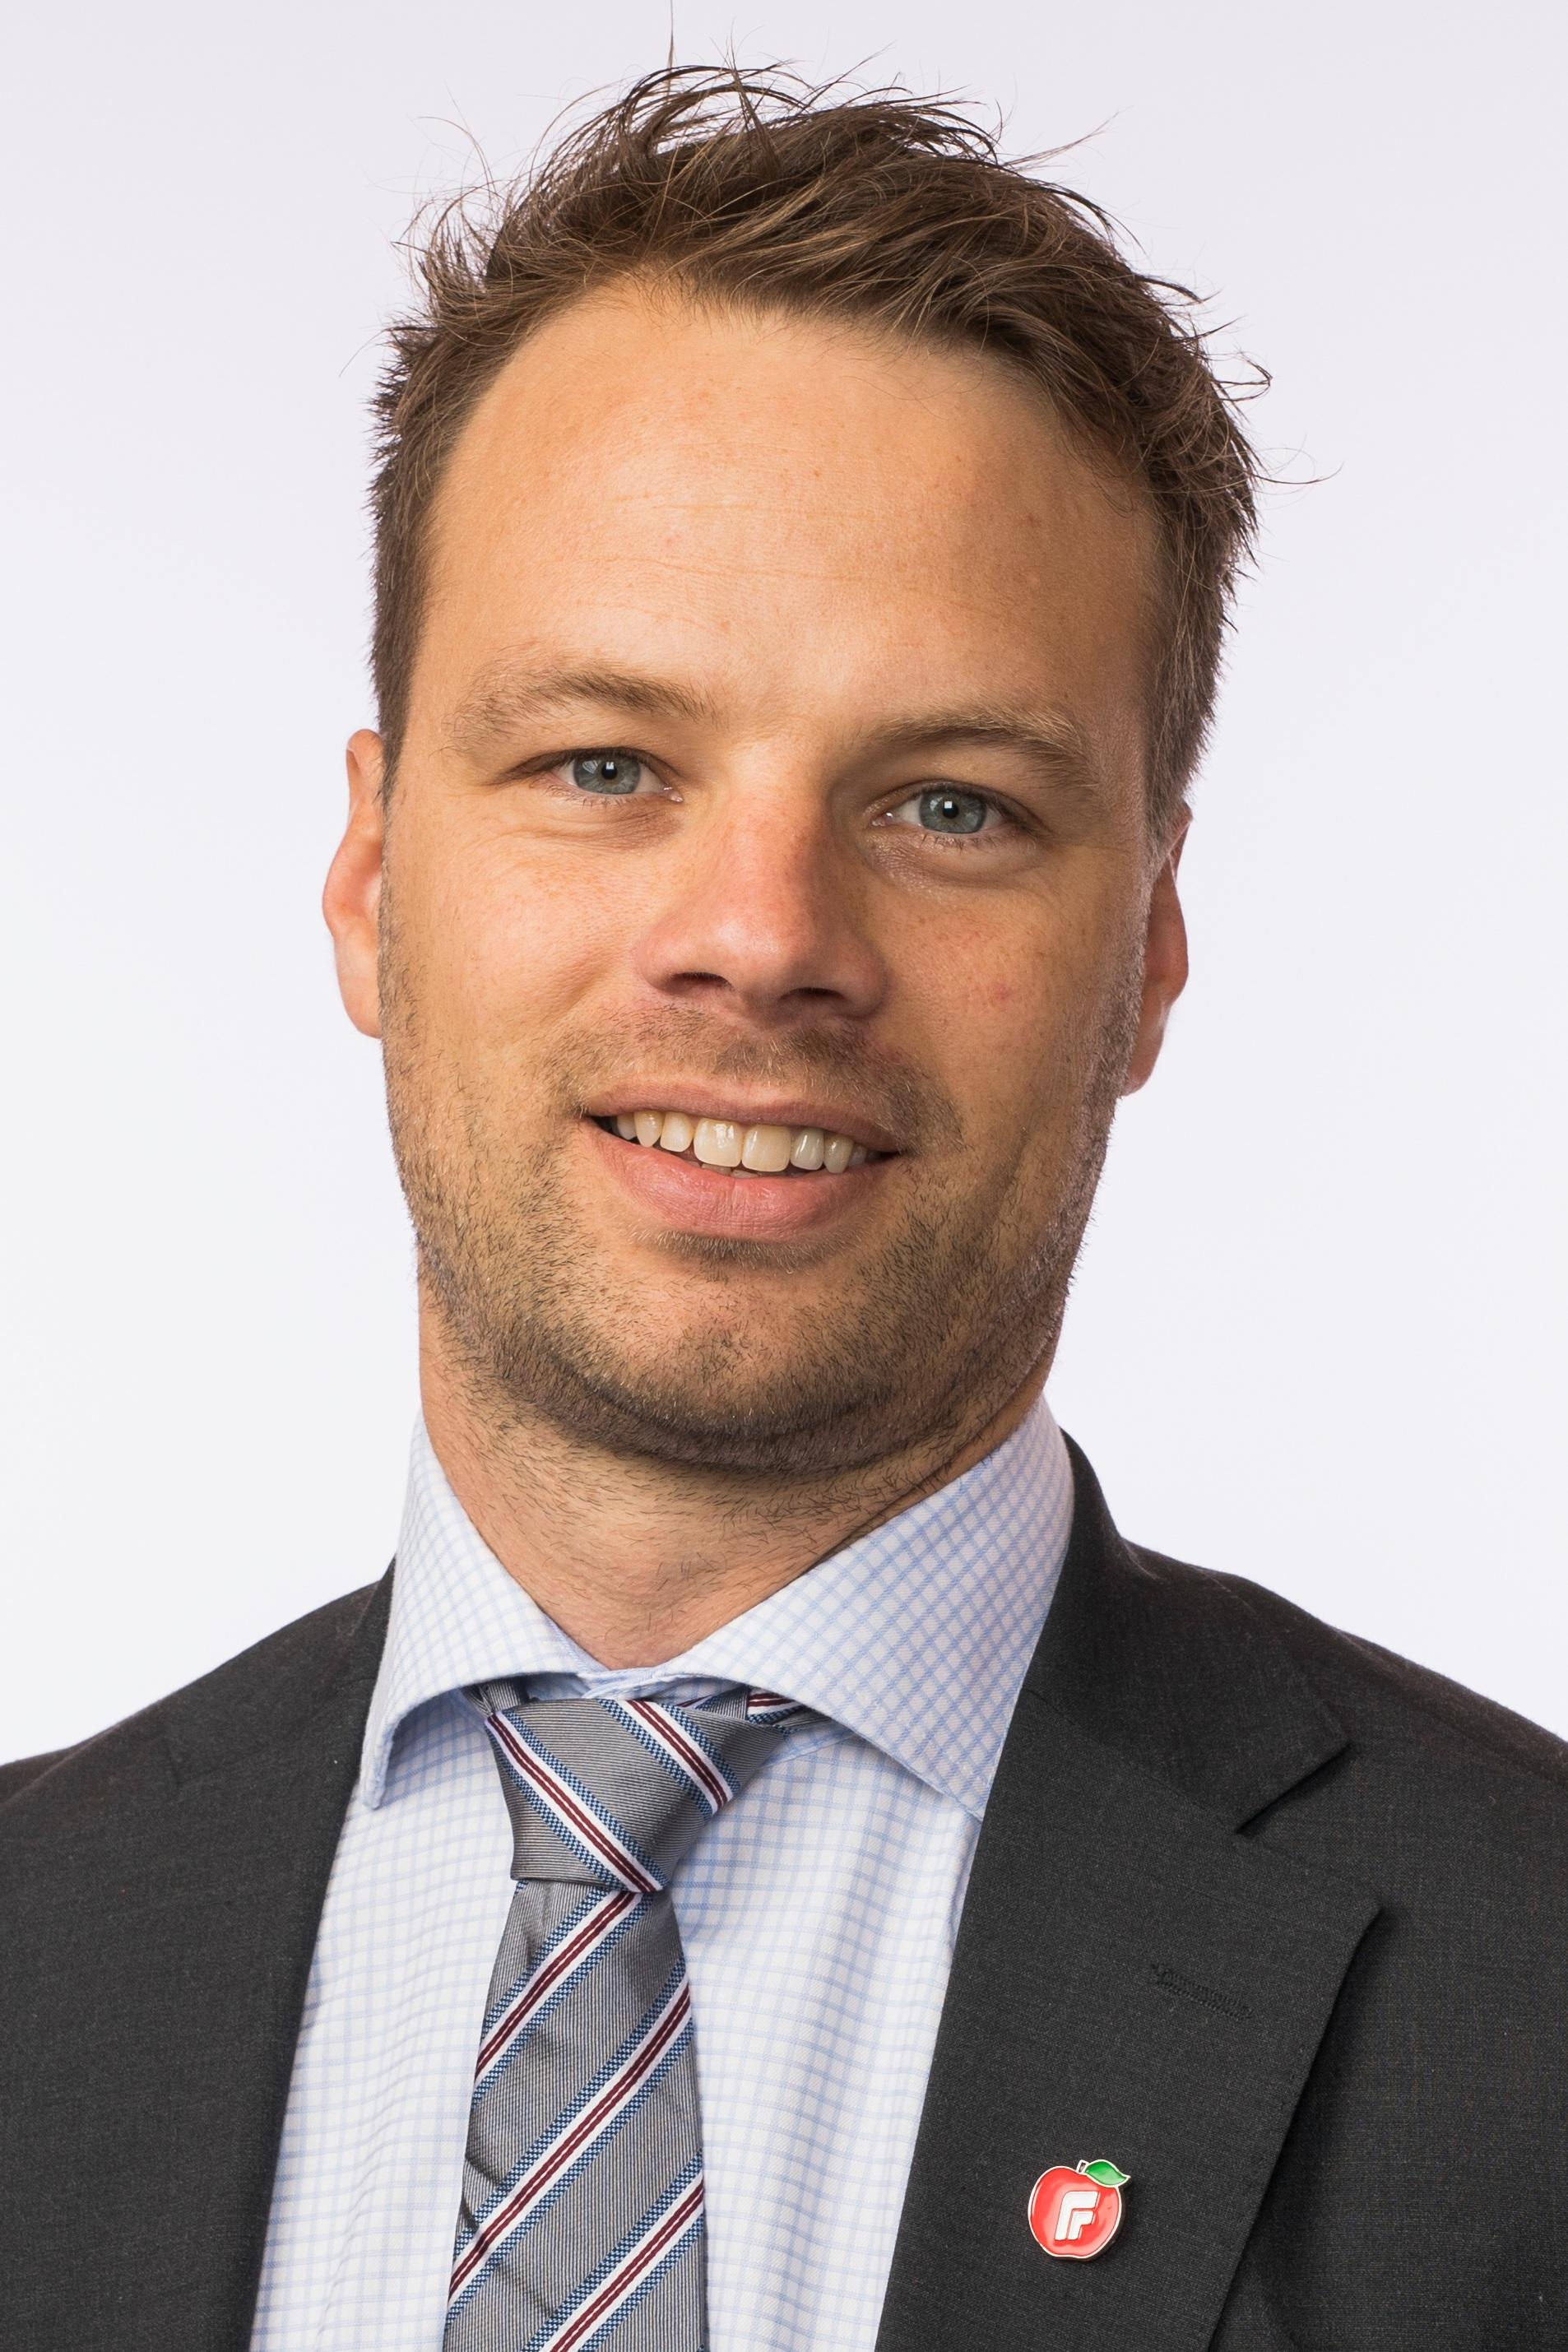 Jon Helgheim, innvandringspolitisk talsperson i Frp.